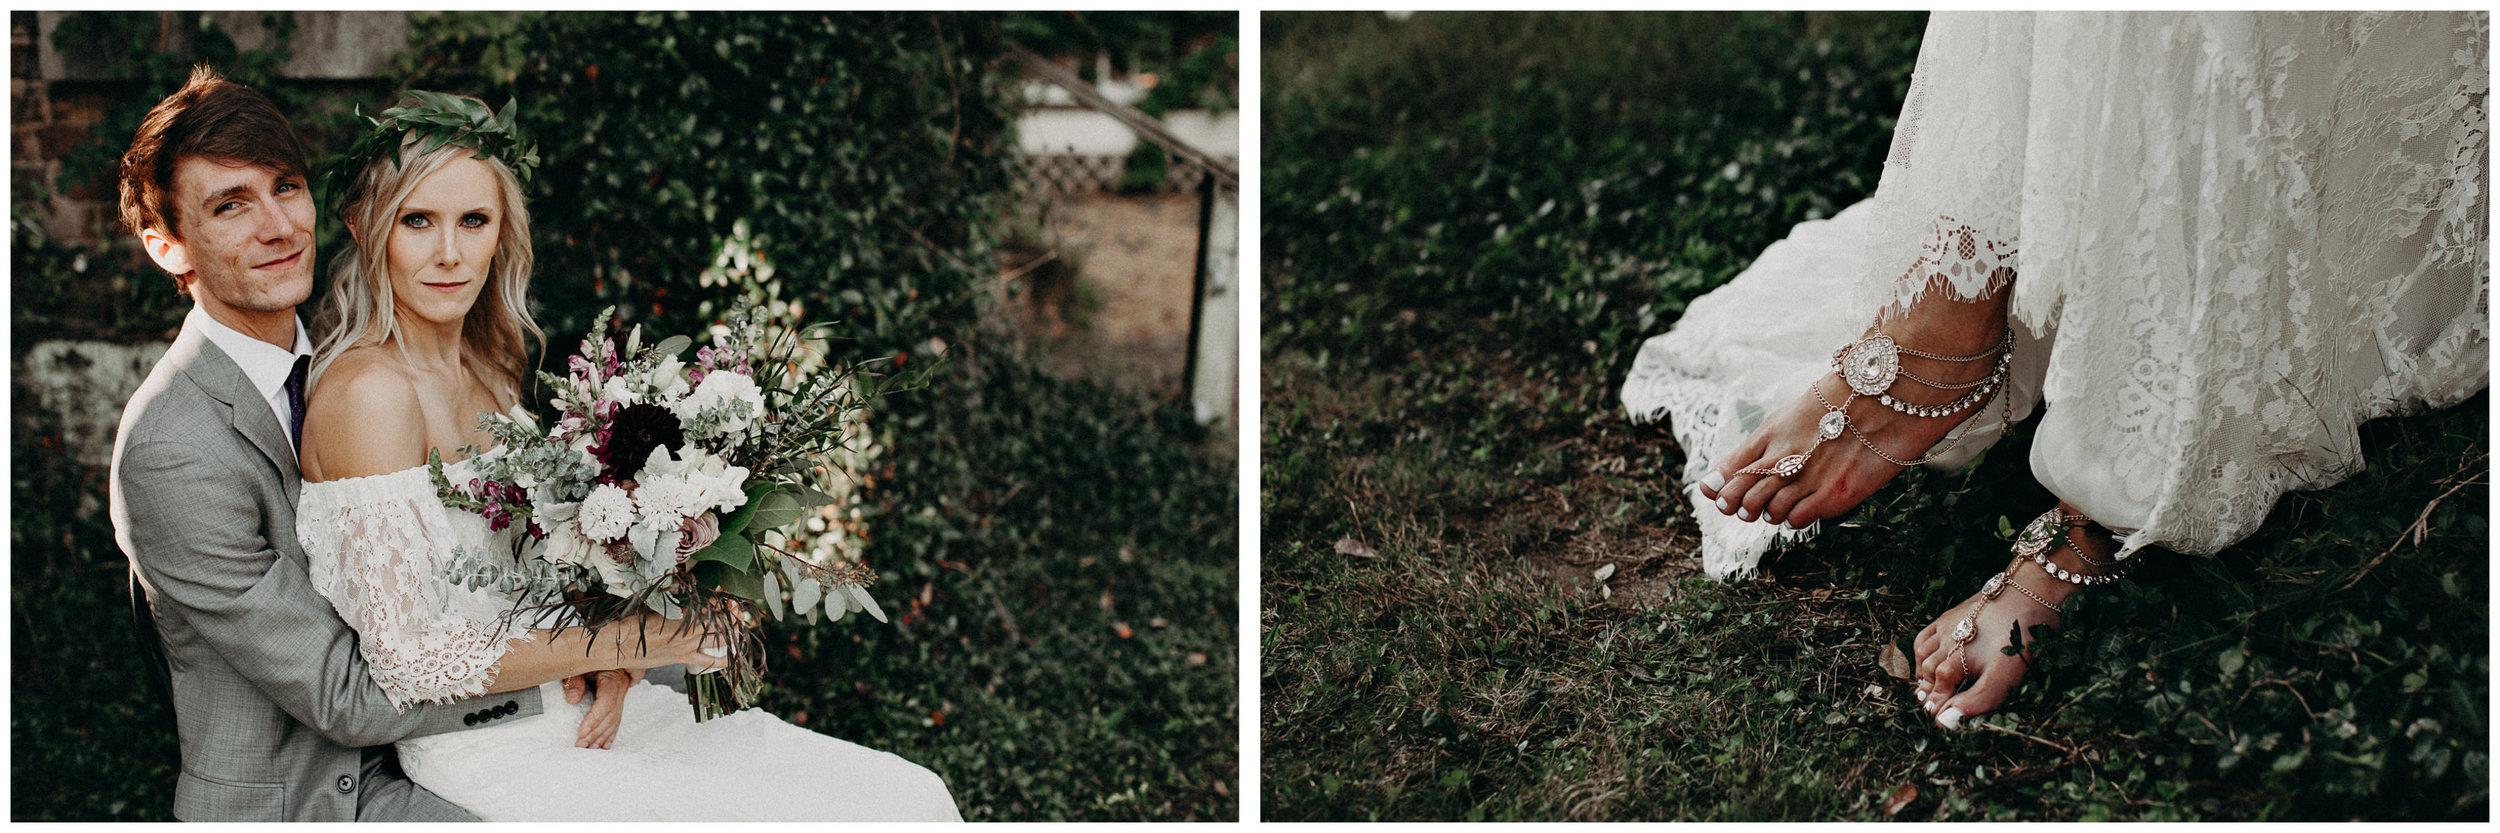 46 - Barnsley Gardens Wedding - Bride & Groom Portraits - Wedding Party portraits - First Look .jpg